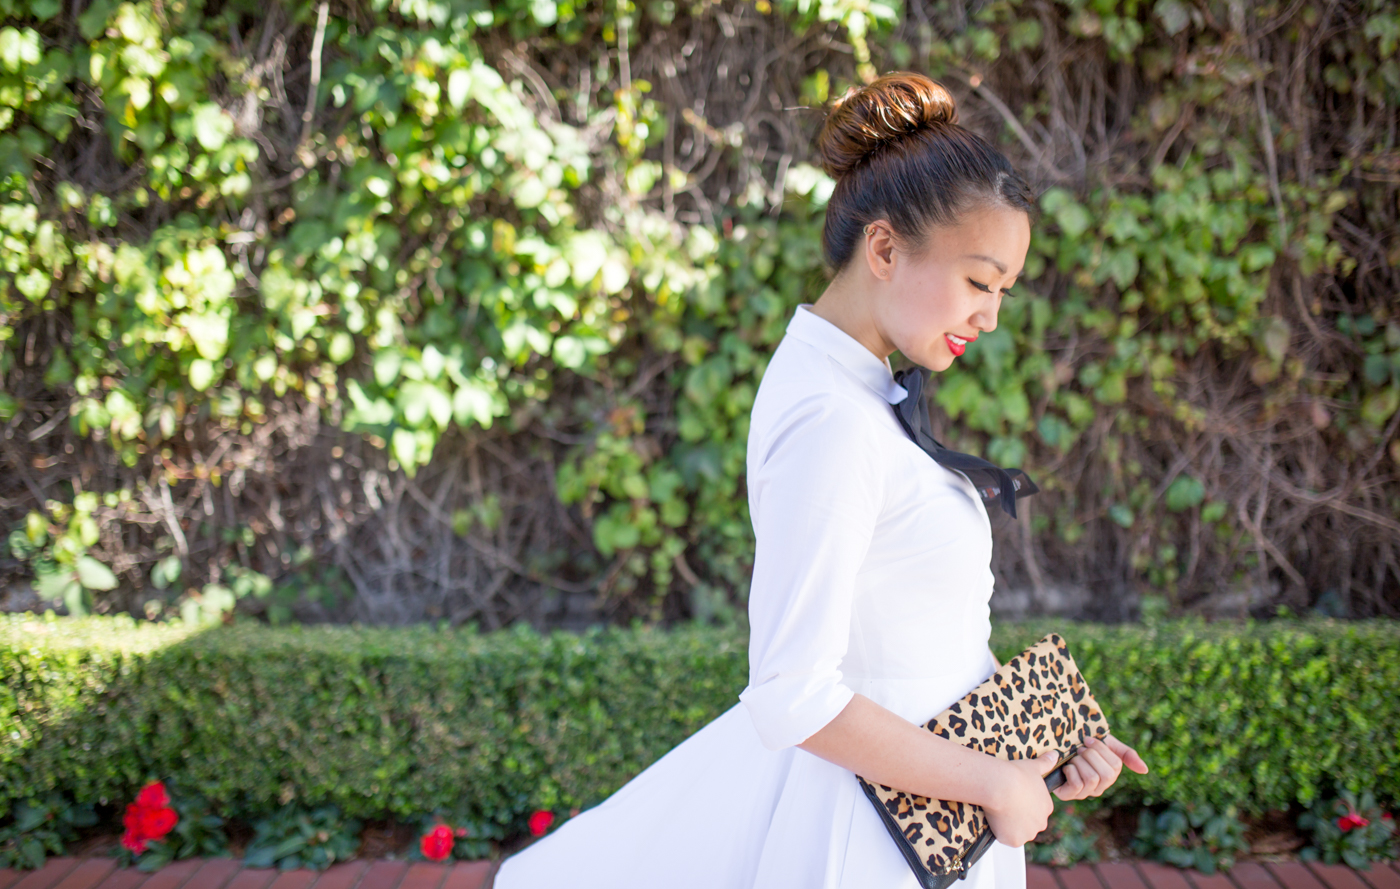 Express White Shirt Dress | via The Chic Diary